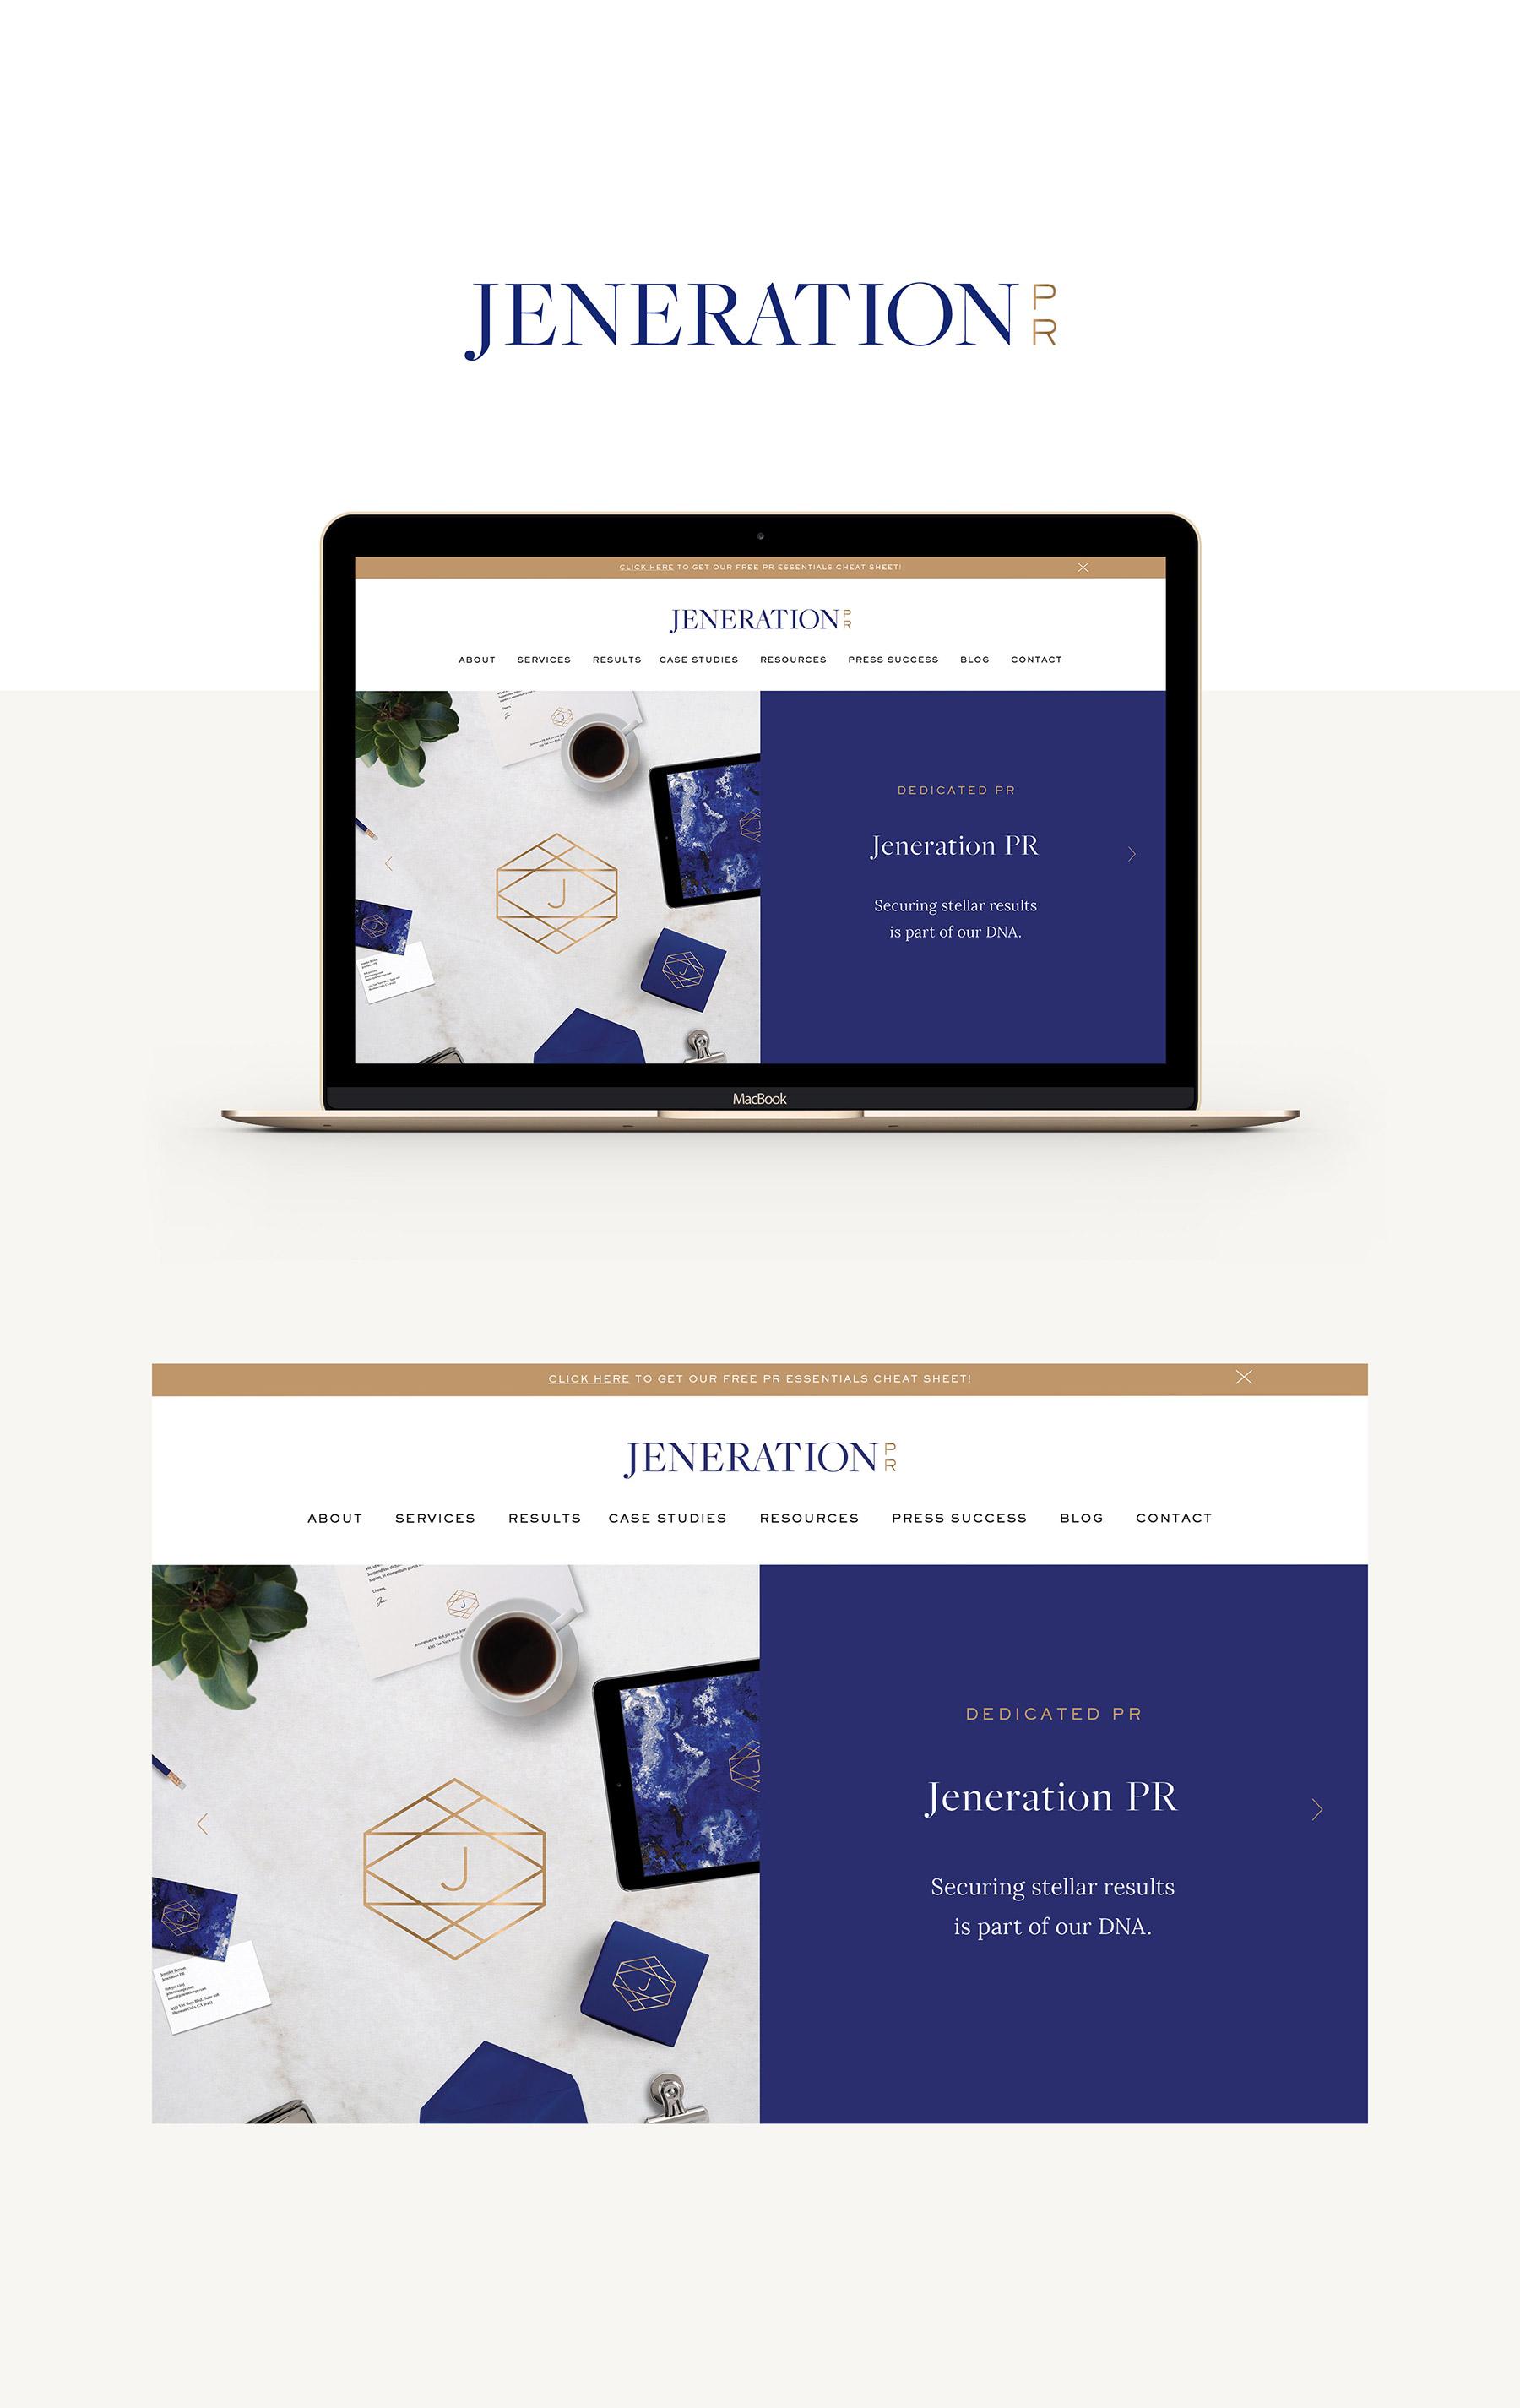 Branch | Jeneration PR